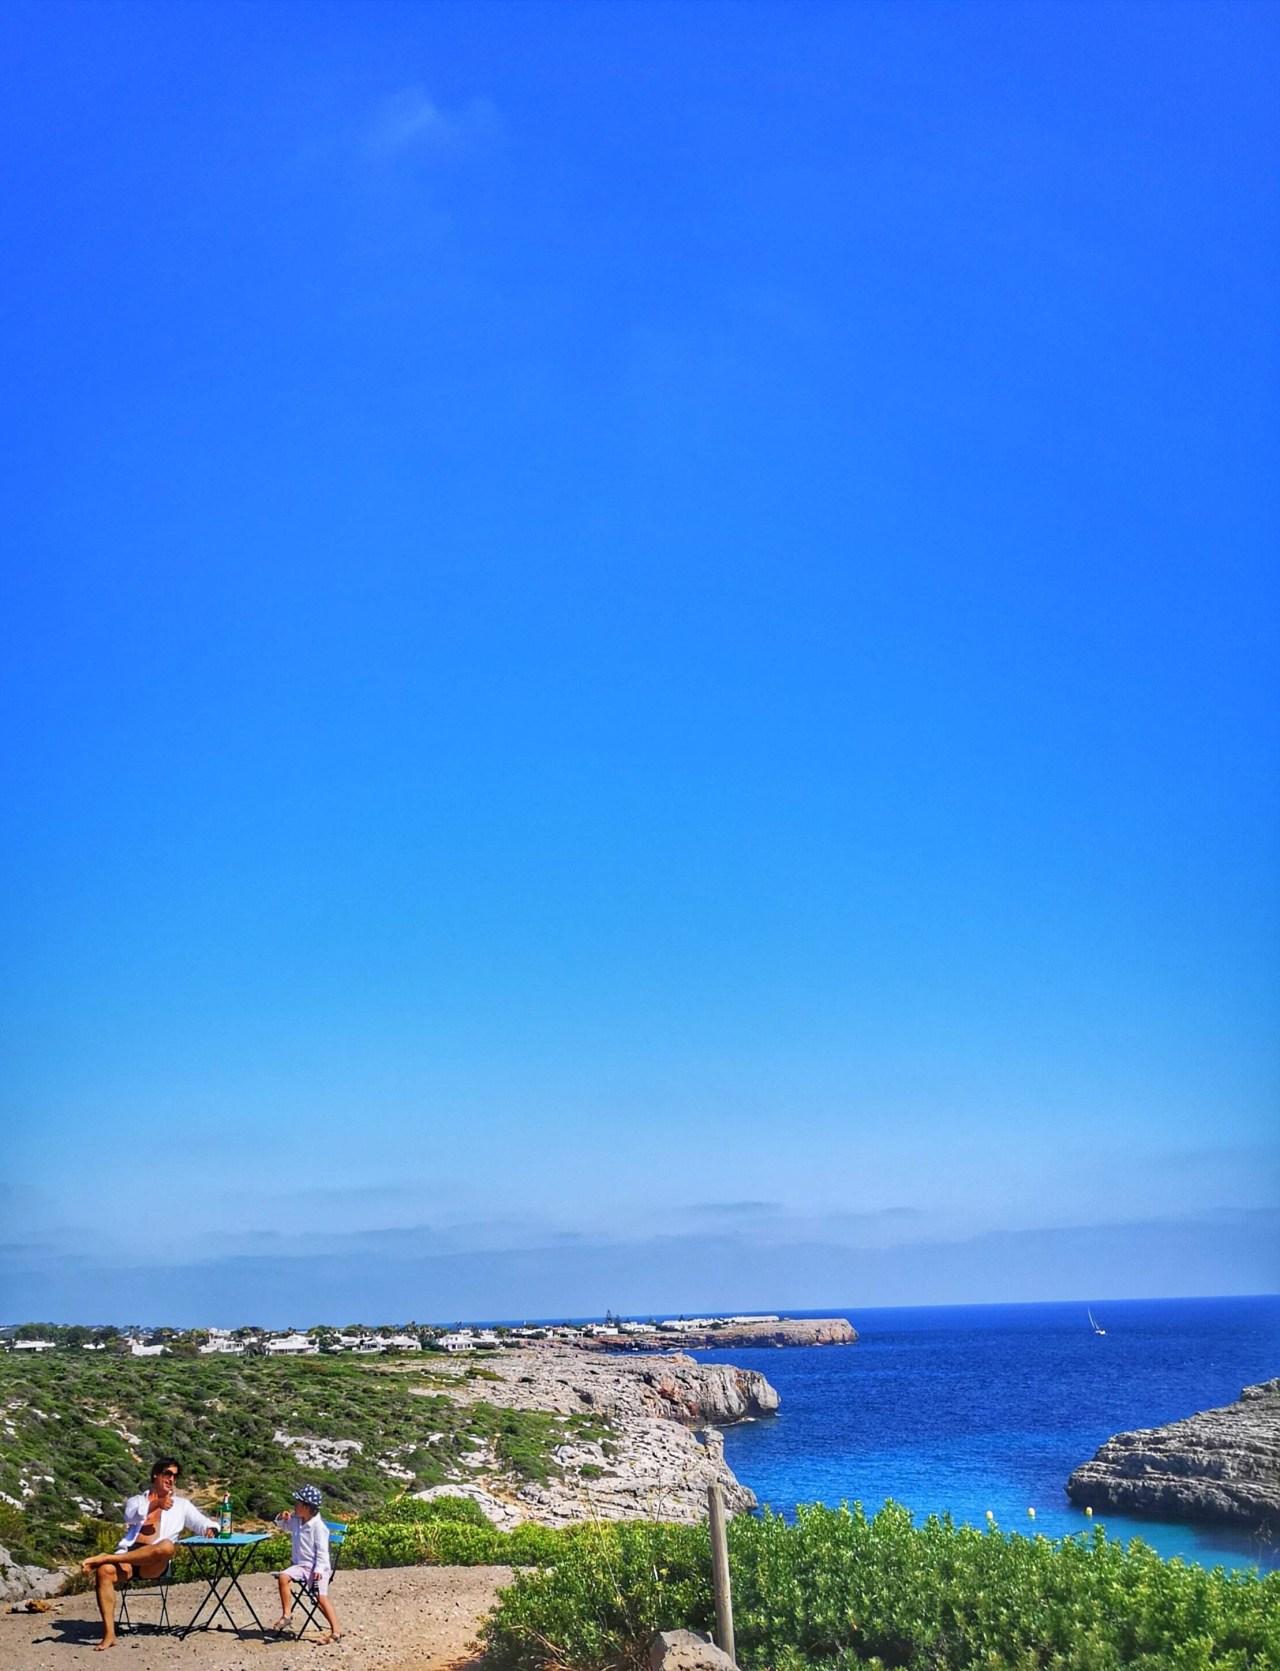 Binidali beach